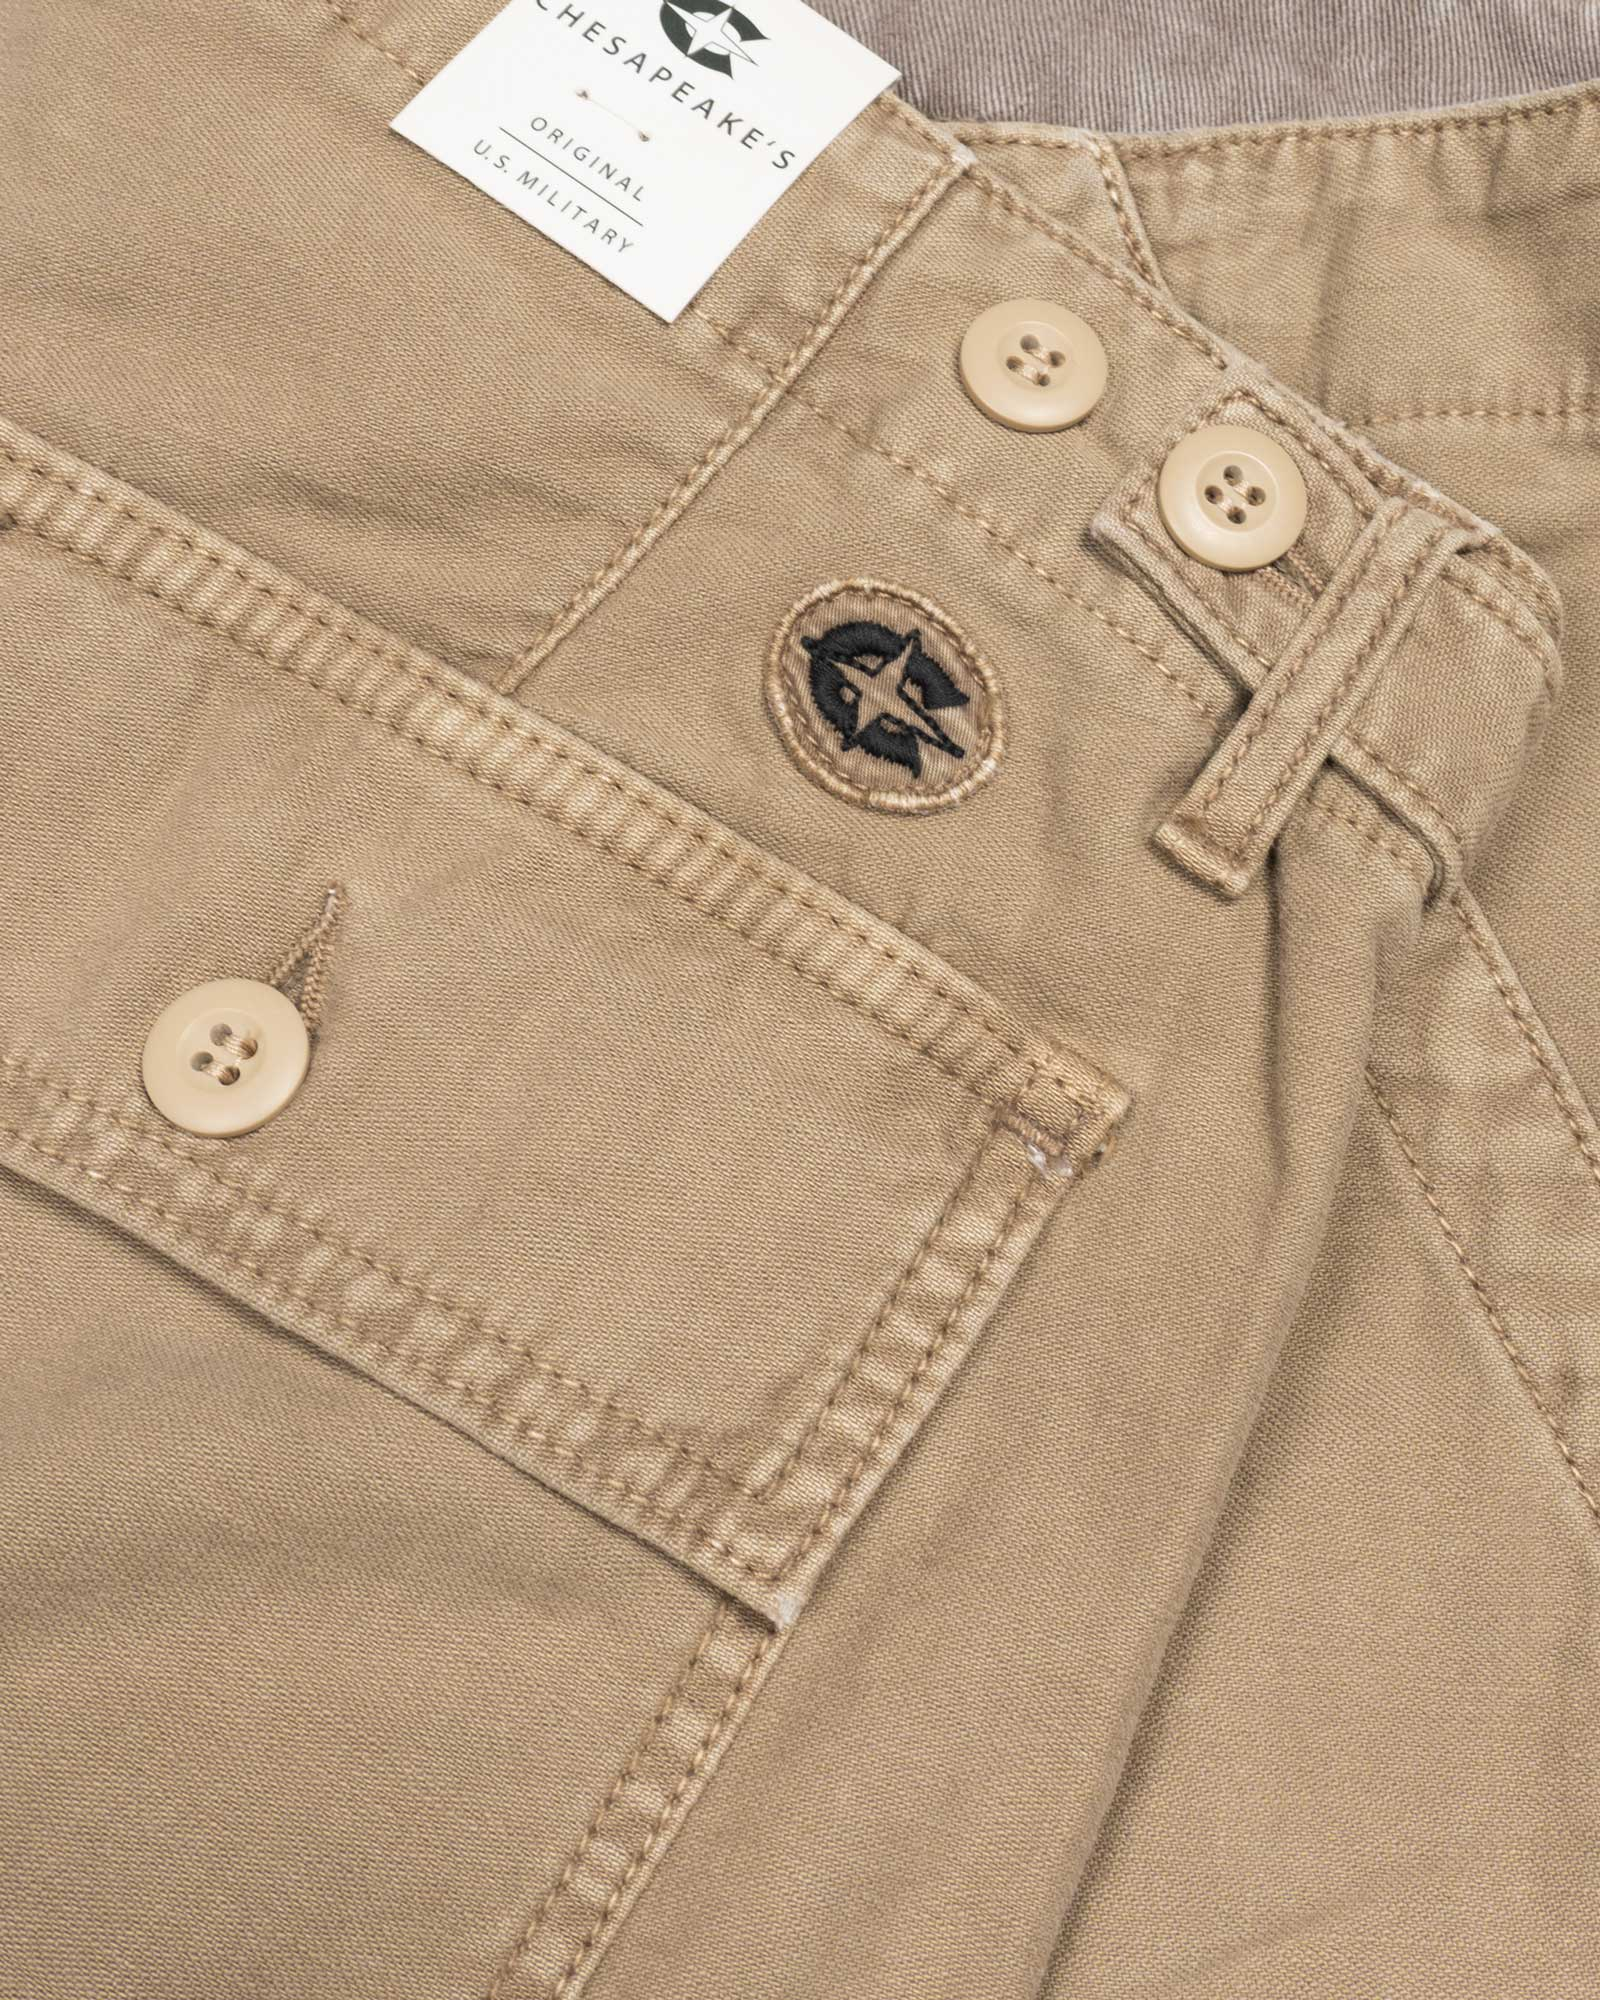 Мужские брюки Chesapeake's DEGRASSE — FATIGUE PANT